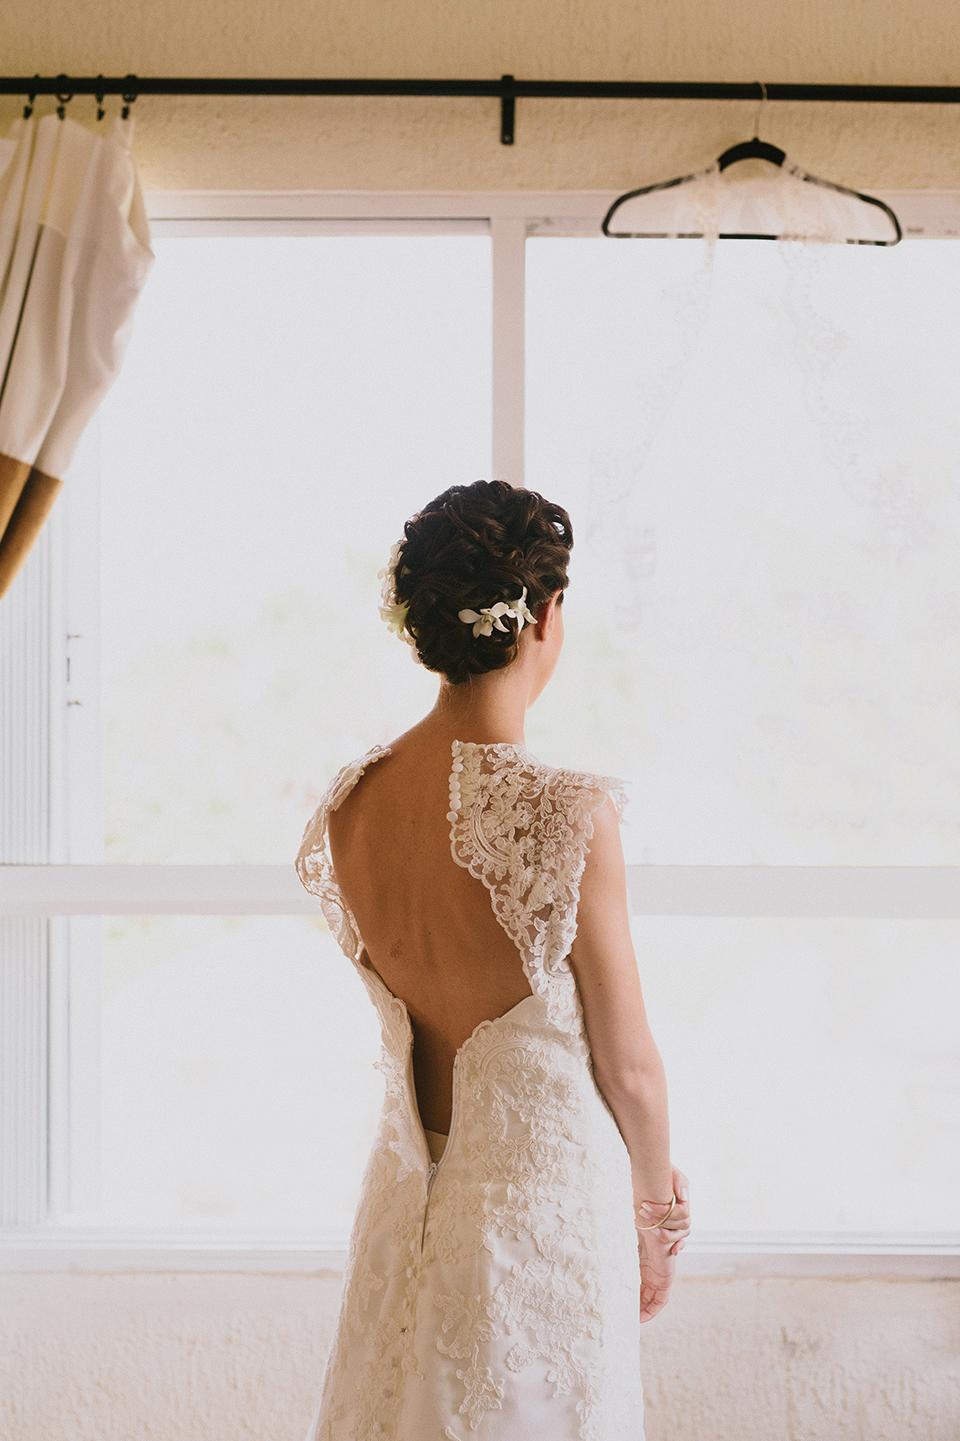 Sam+Alejandro_PlayadelCarmen_KapePhotography_destinationwedding_weddingphotography_mexico_fotografo_boda_cancun_rivieramaya_villasolyluna011.jpg